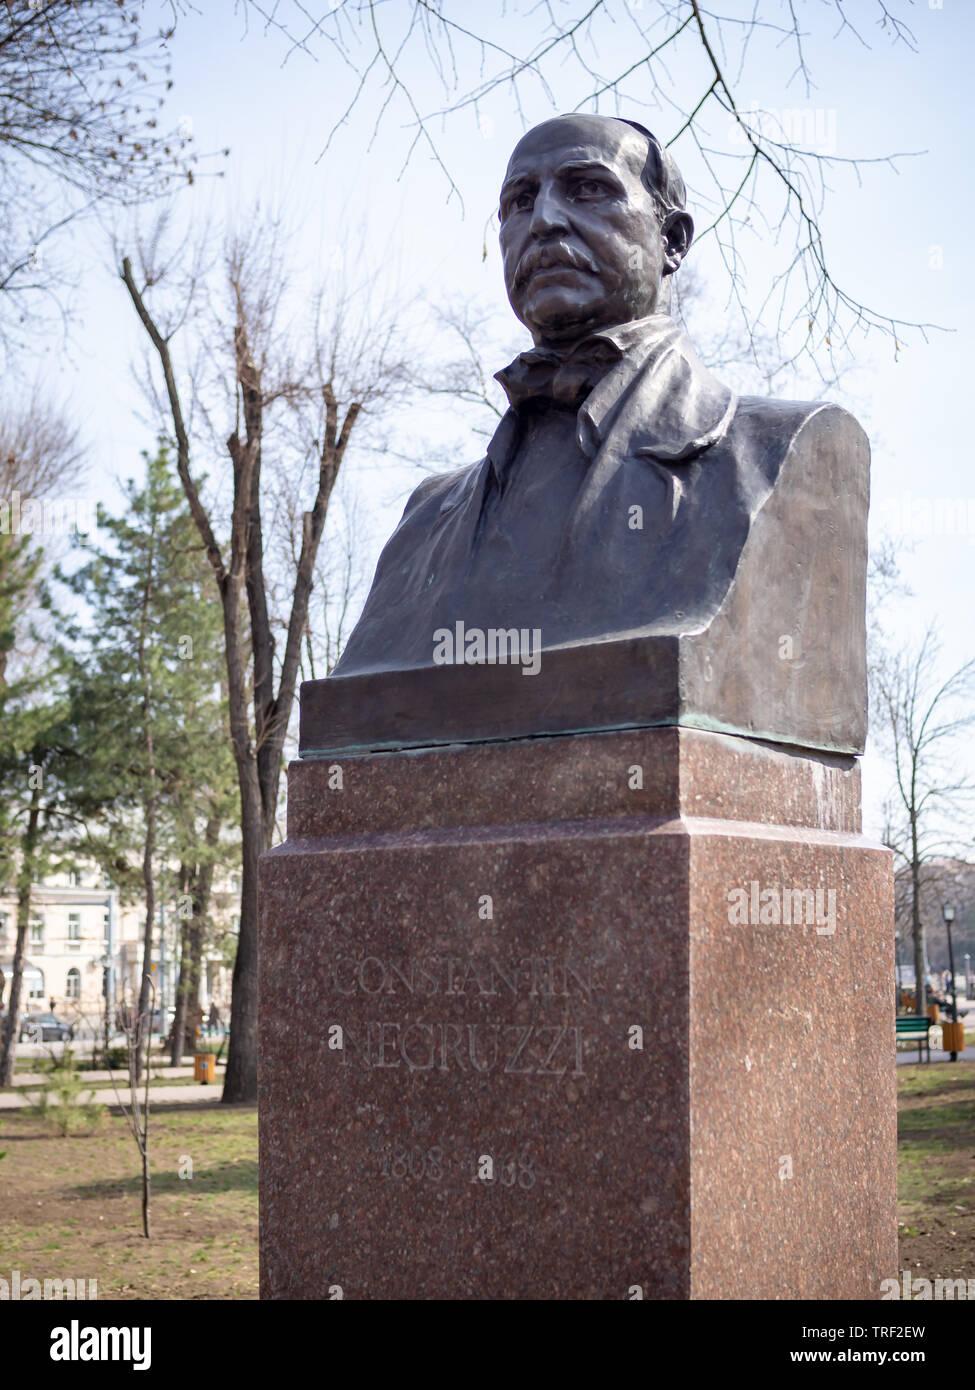 CHISINAU, MOLDOVA-MARCH 21, 2019:  Constantin Negruzzi bust by Lazar Dubinovschi & Aleksandr Maiko in the Alley of Classics - Stock Image